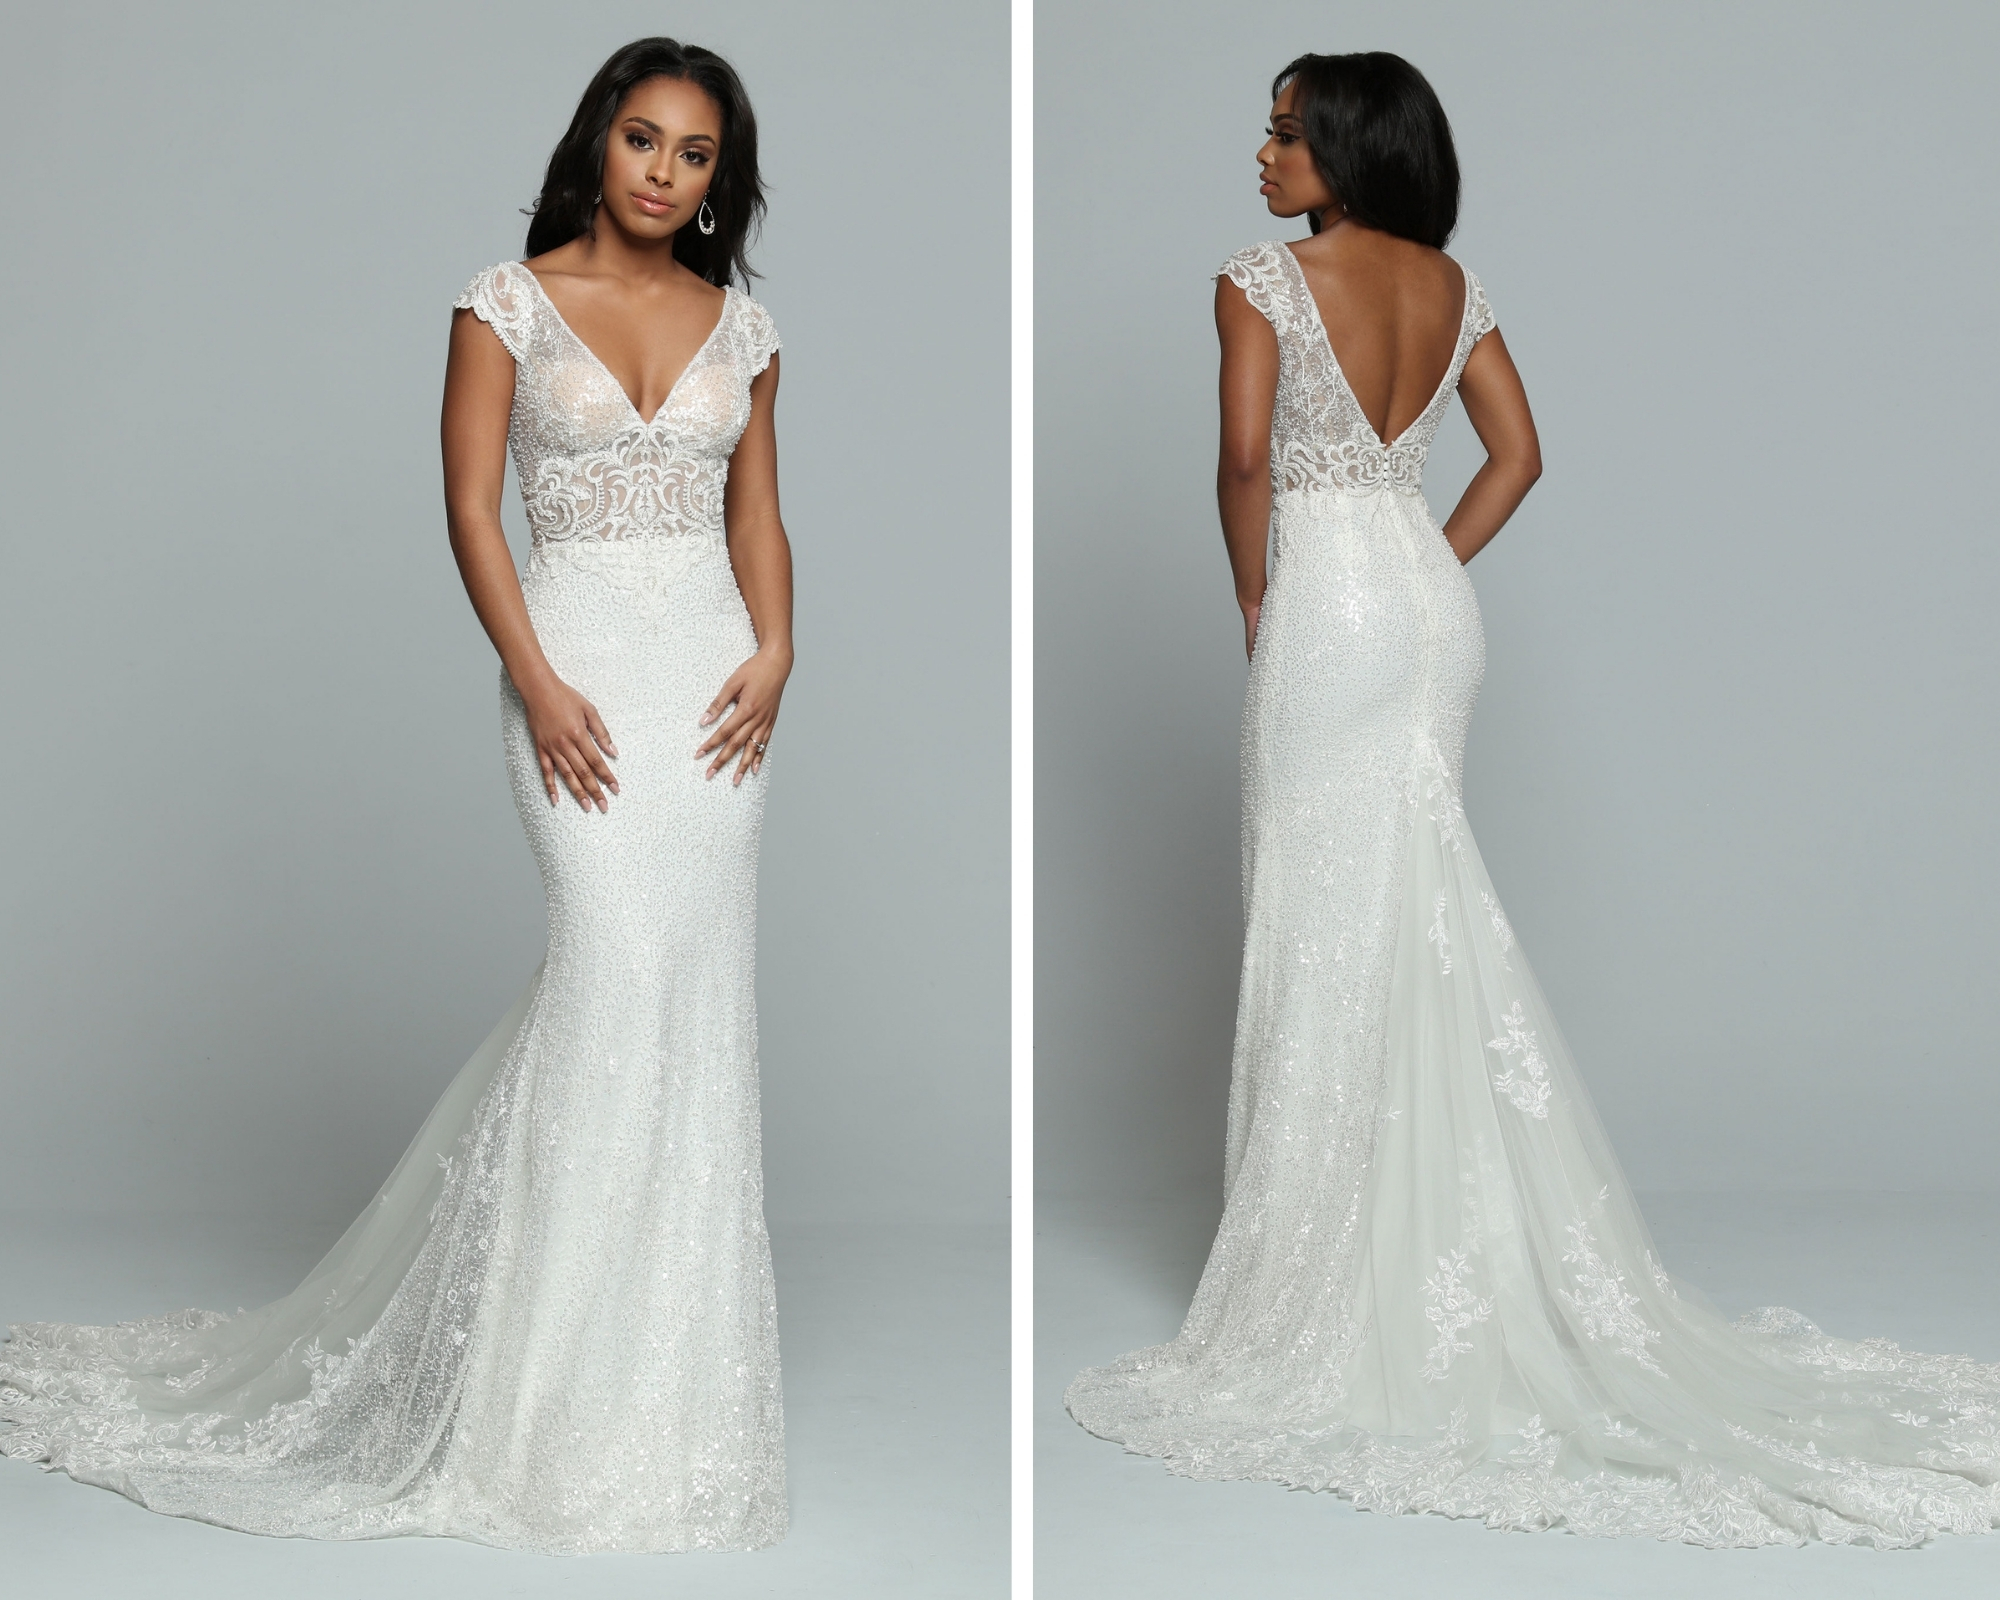 2021 Fit & Flare Wedding Dresses Sneak Peek